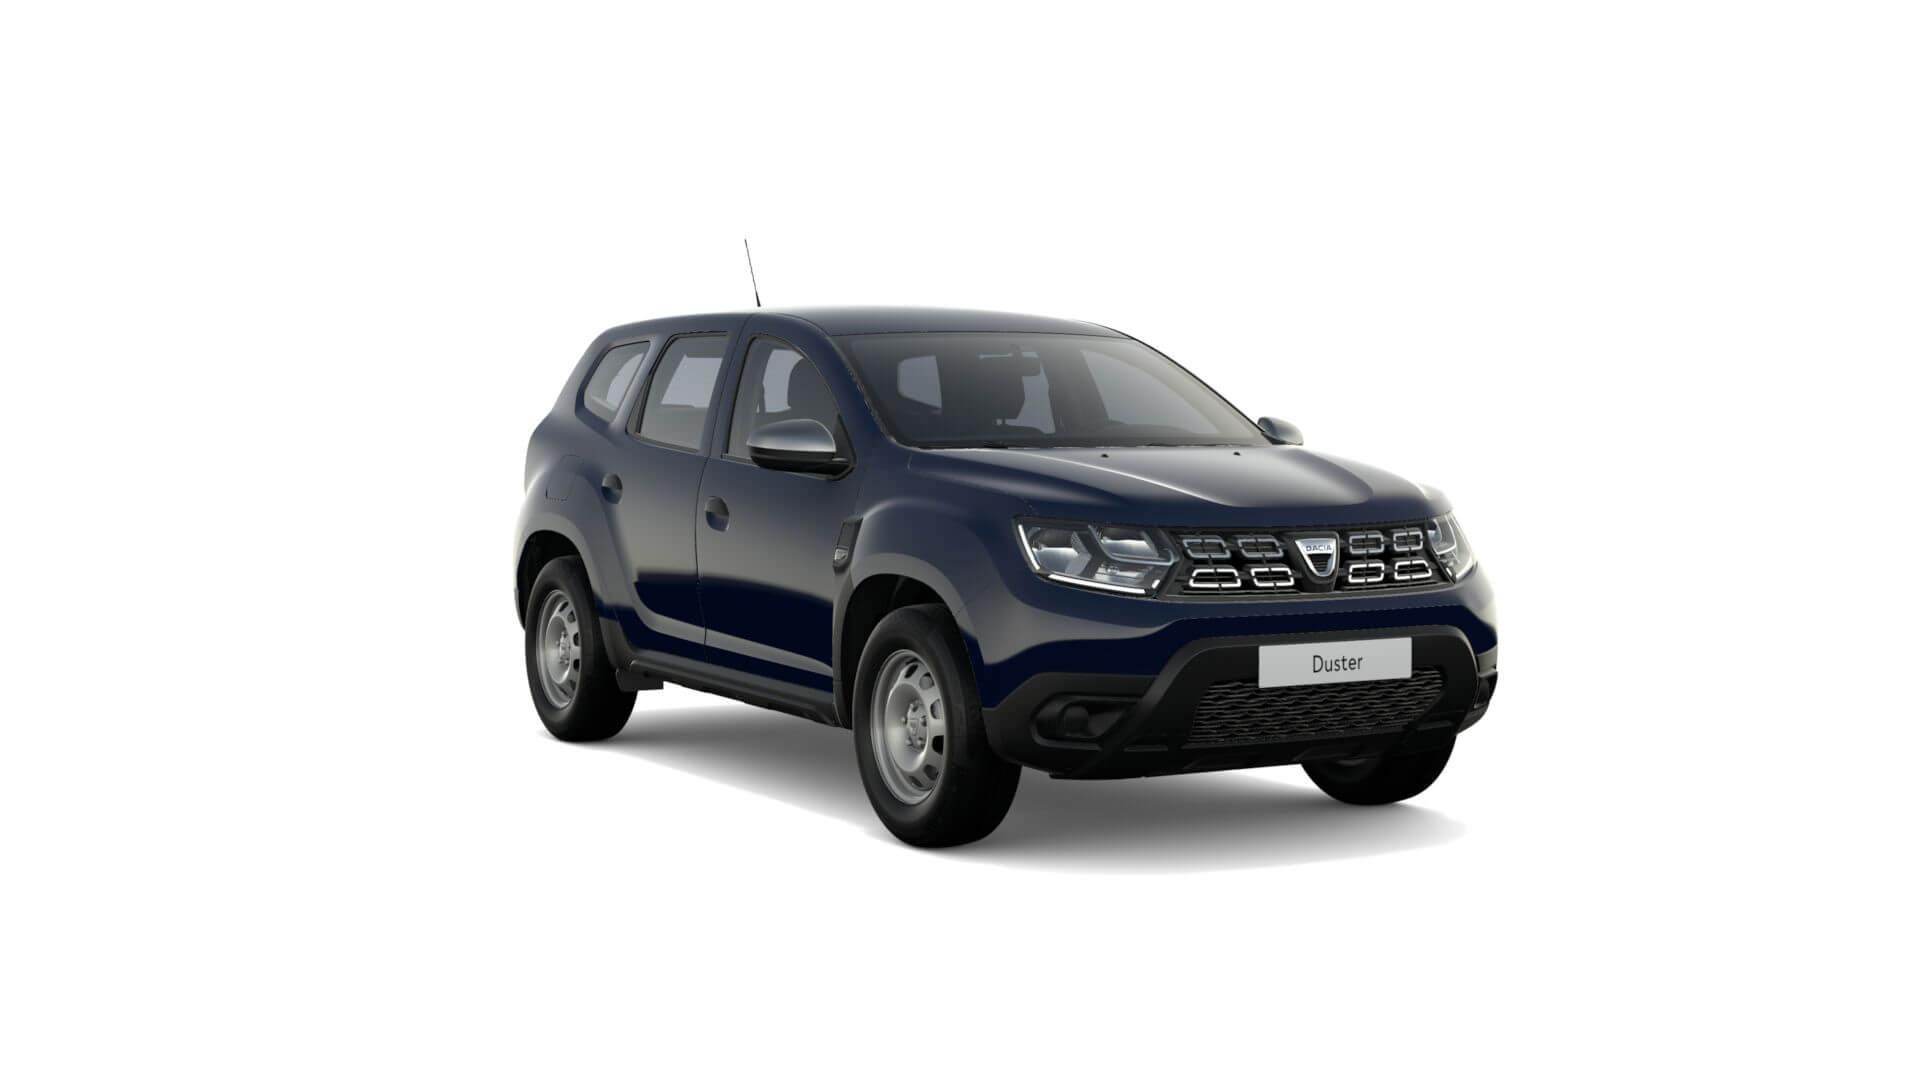 Automodell blau - Dacia Duster - Renault Ahrens Hannover